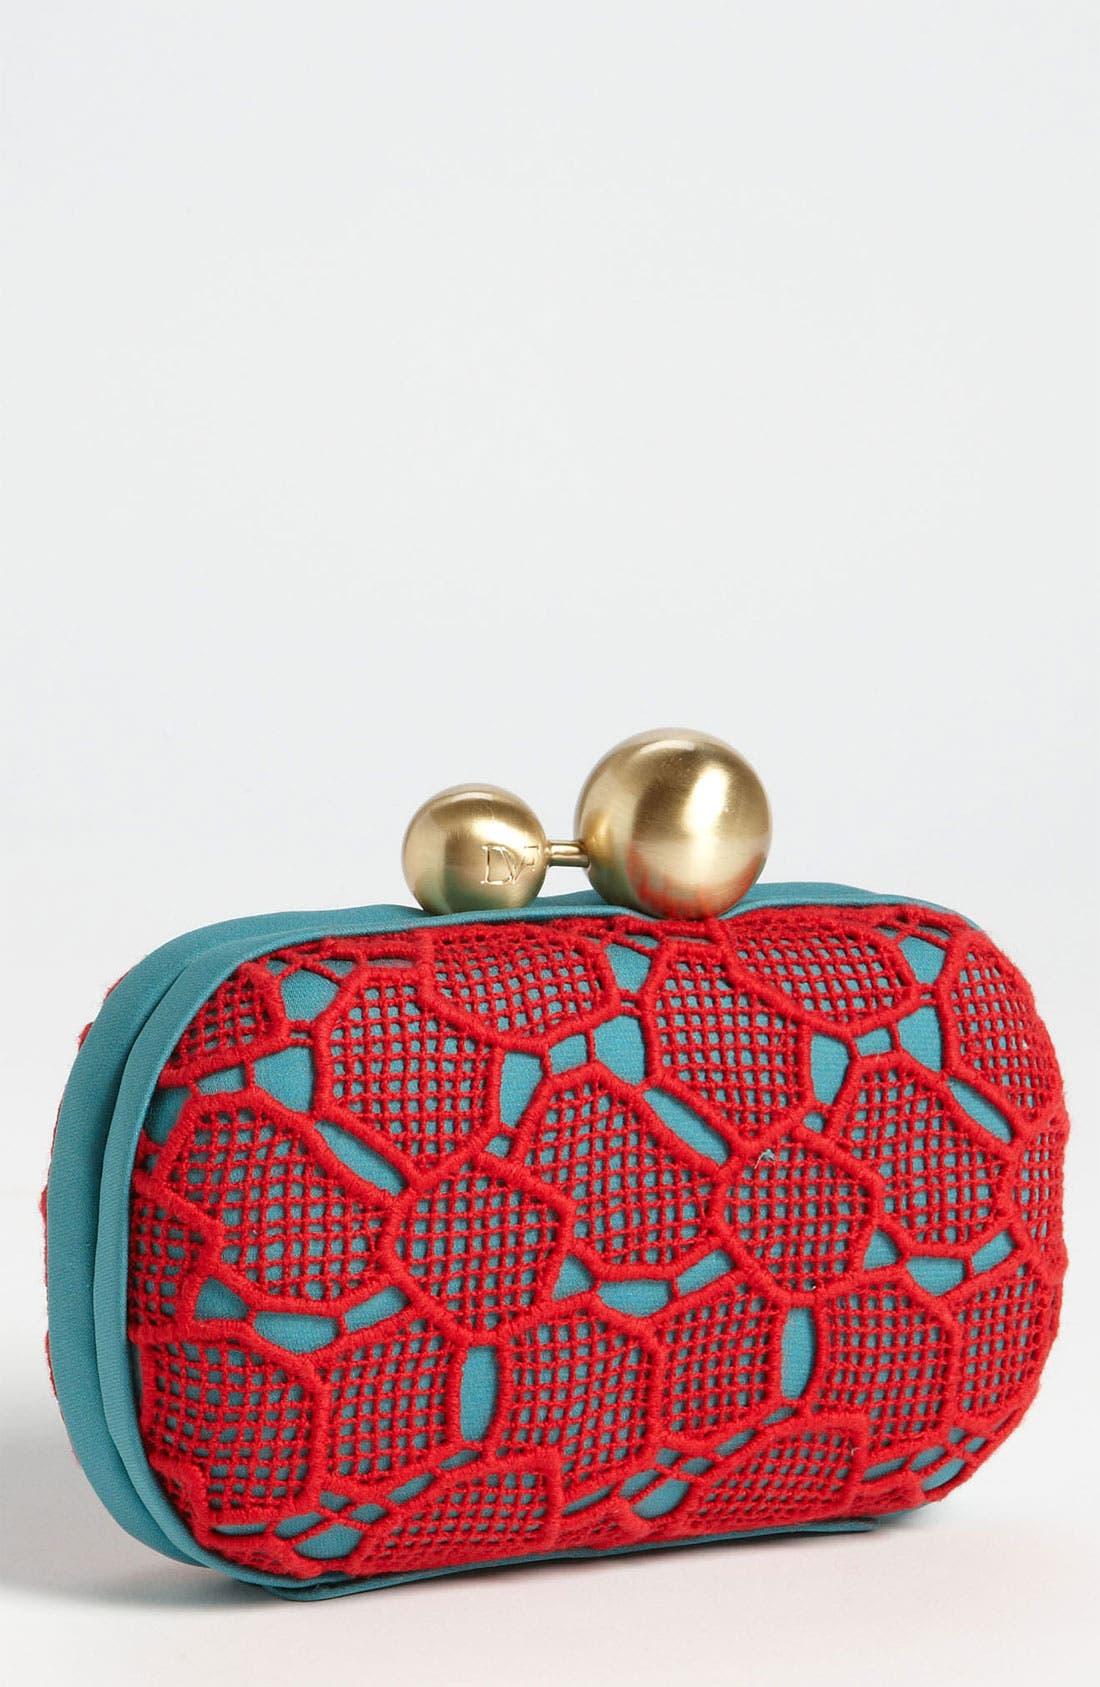 Alternate Image 1 Selected - Diane von Furstenberg 'Sphere' Lace Clutch